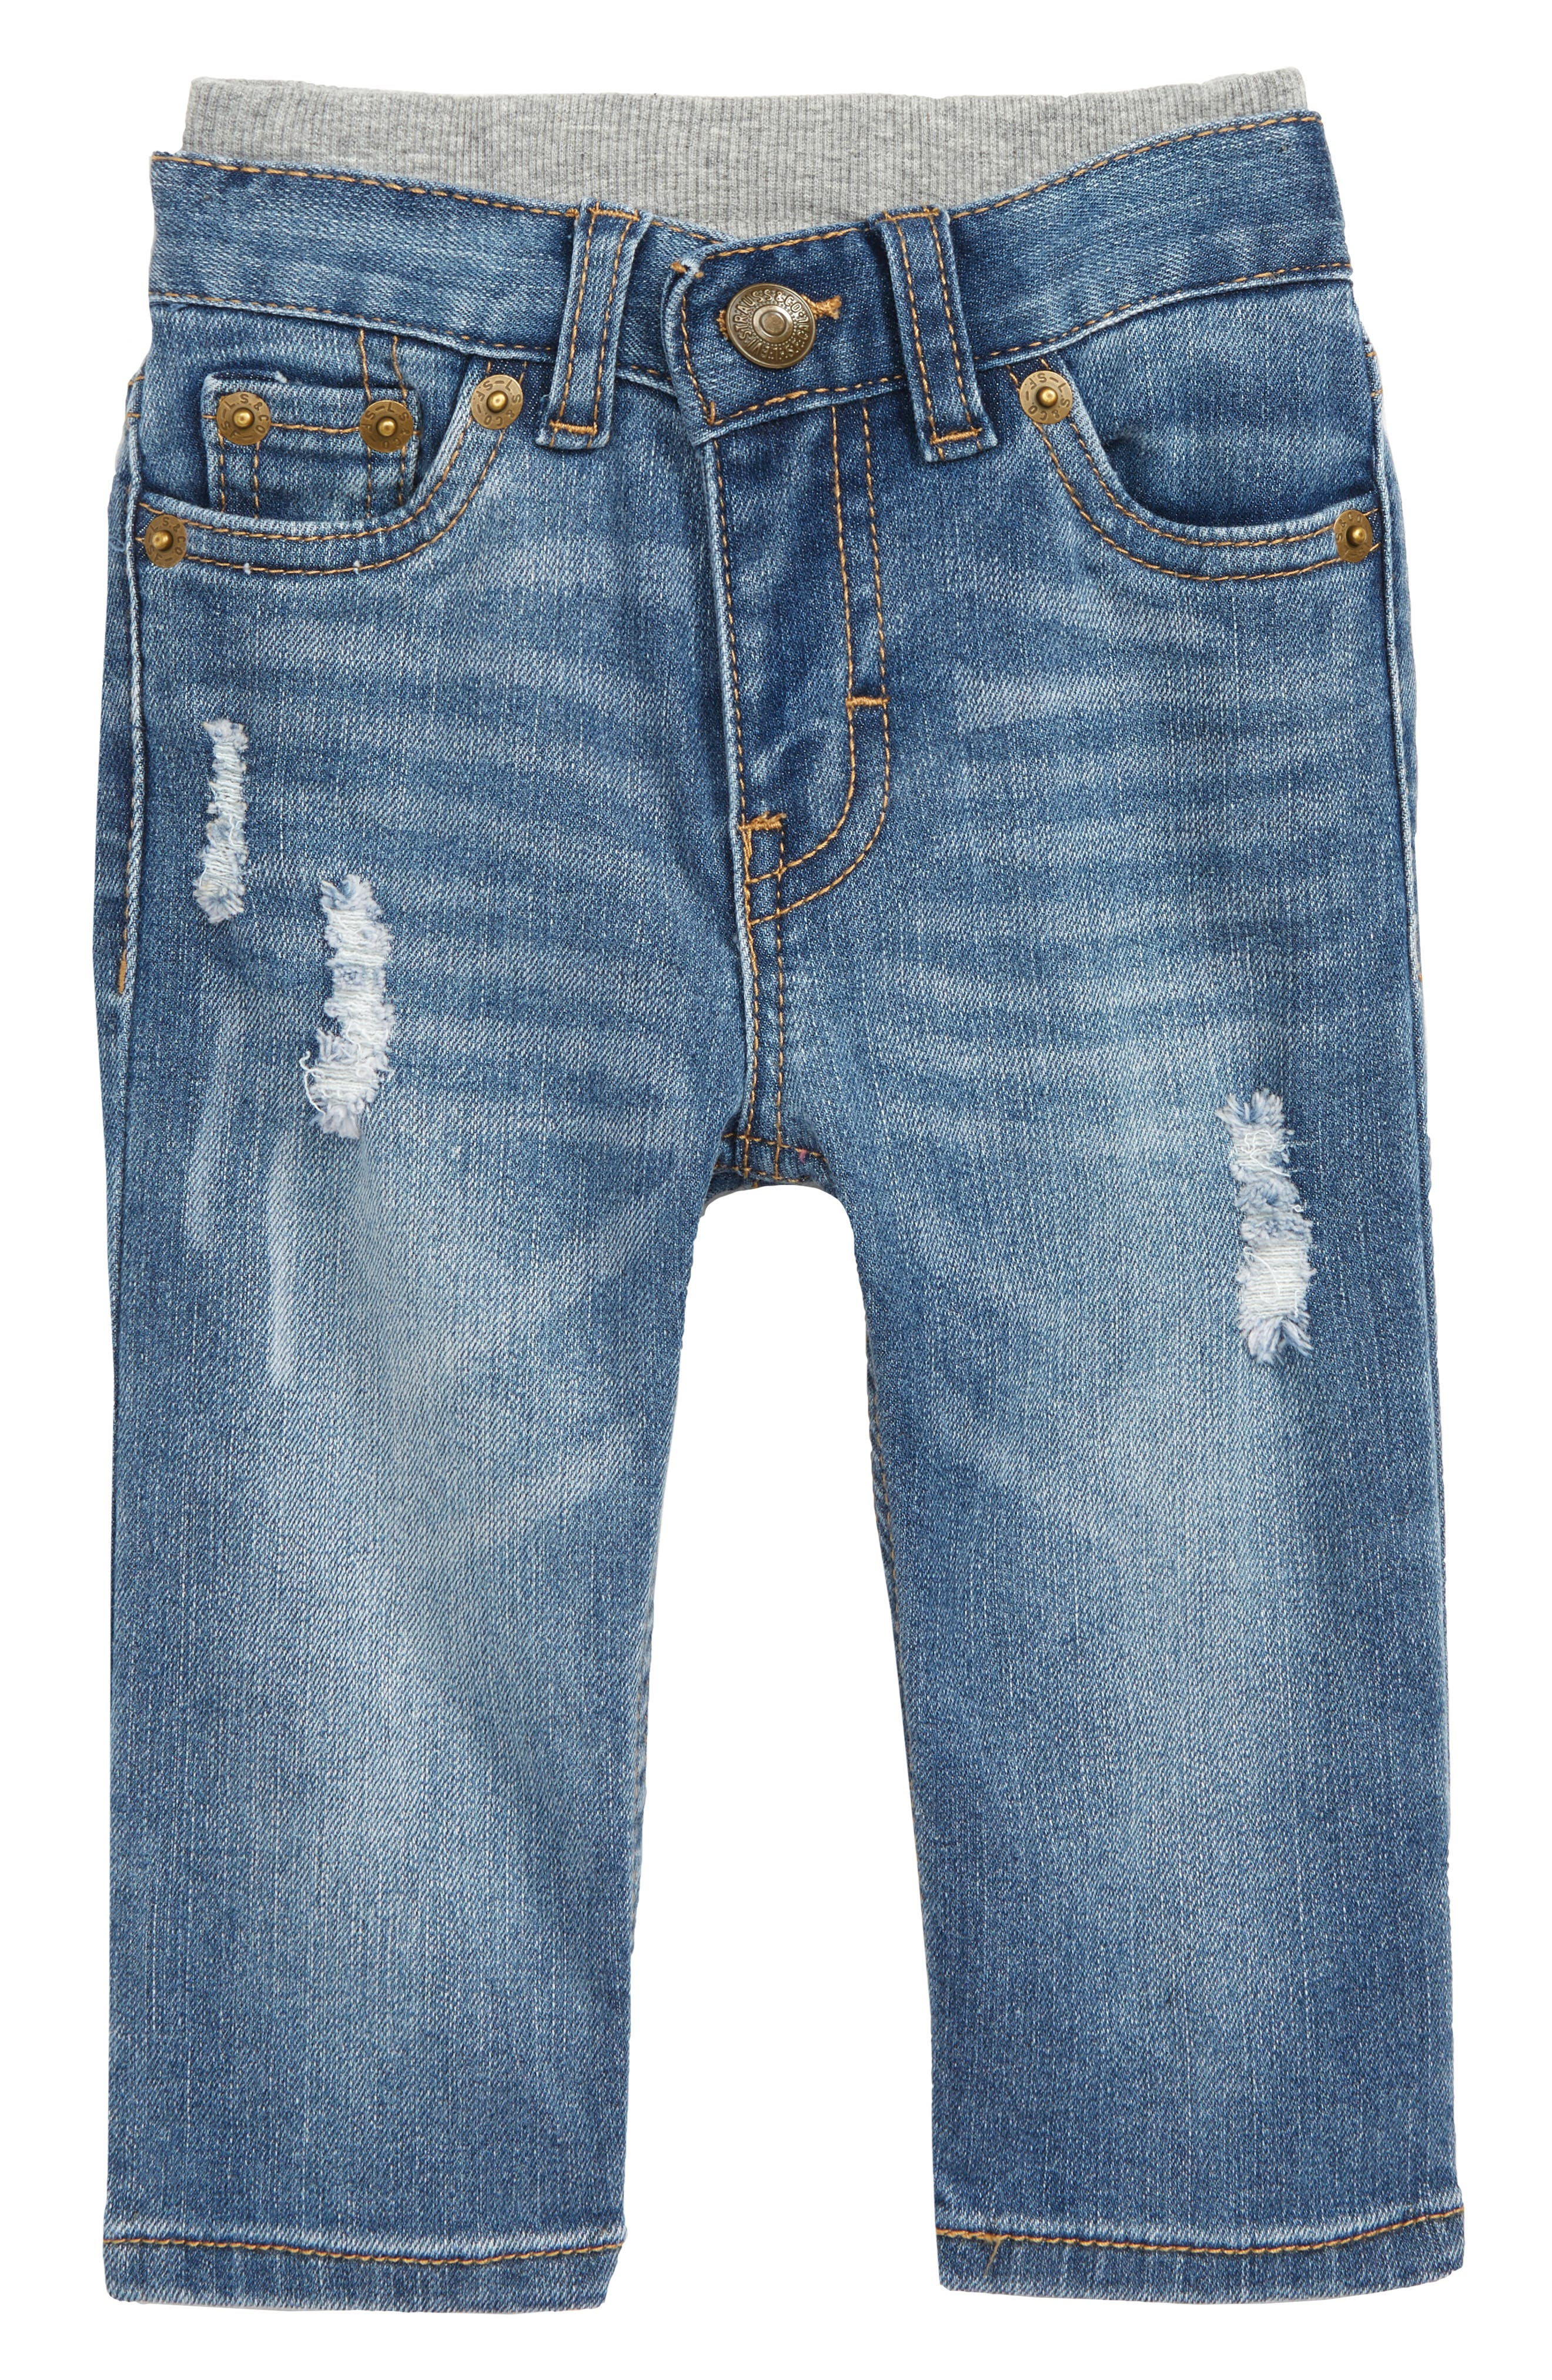 Murphy Jeans,                             Main thumbnail 1, color,                             400